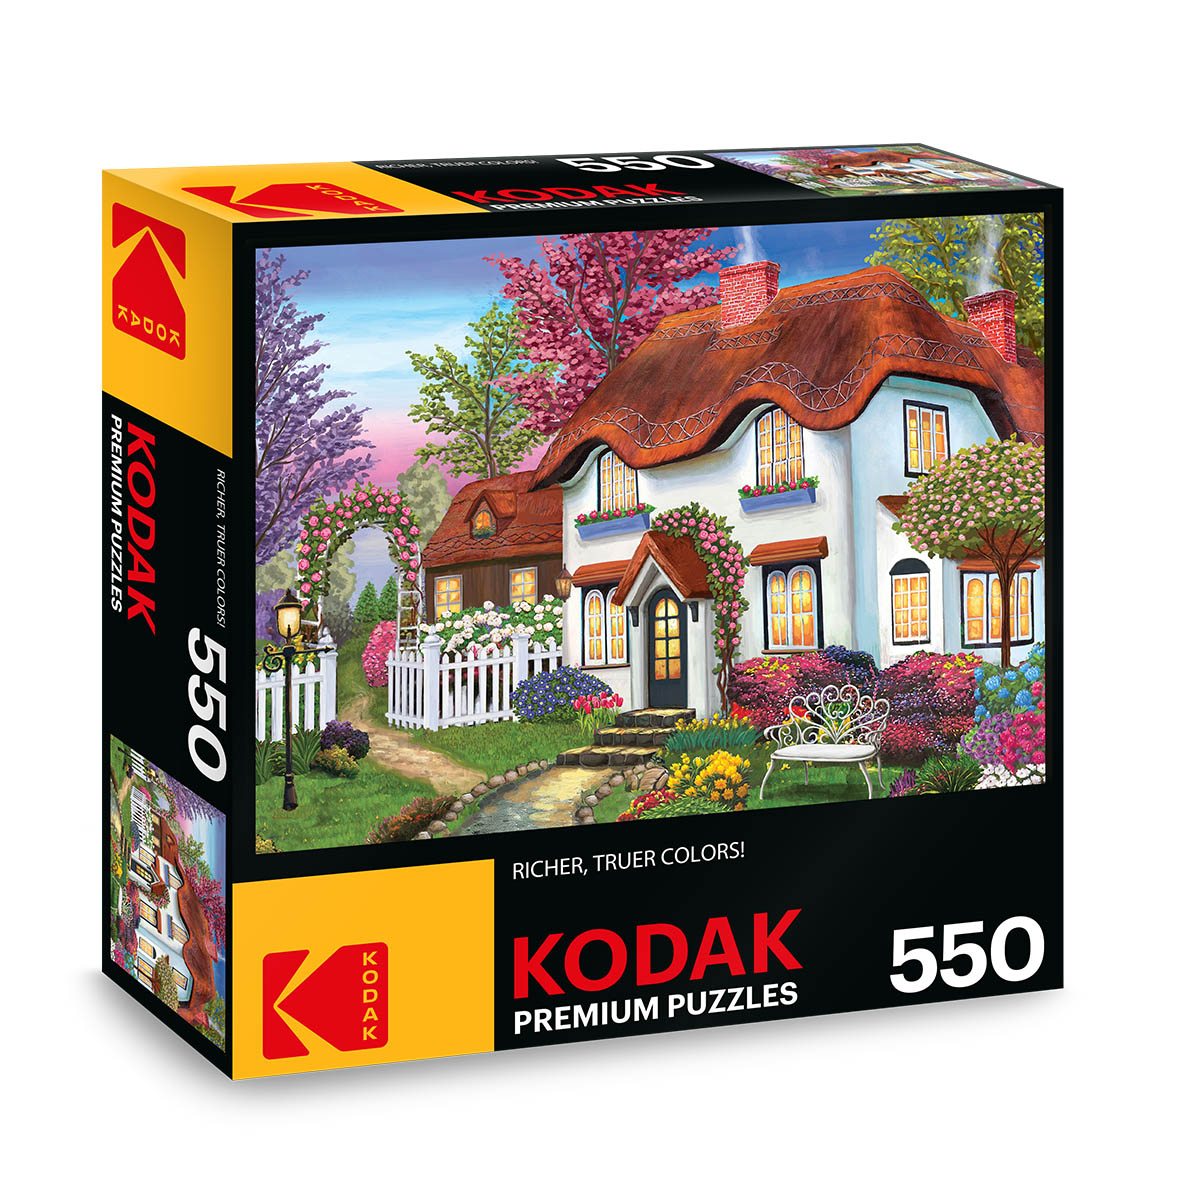 KODAK Premium Puzzles - Cozy Cottage Photography Jigsaw Puzzle